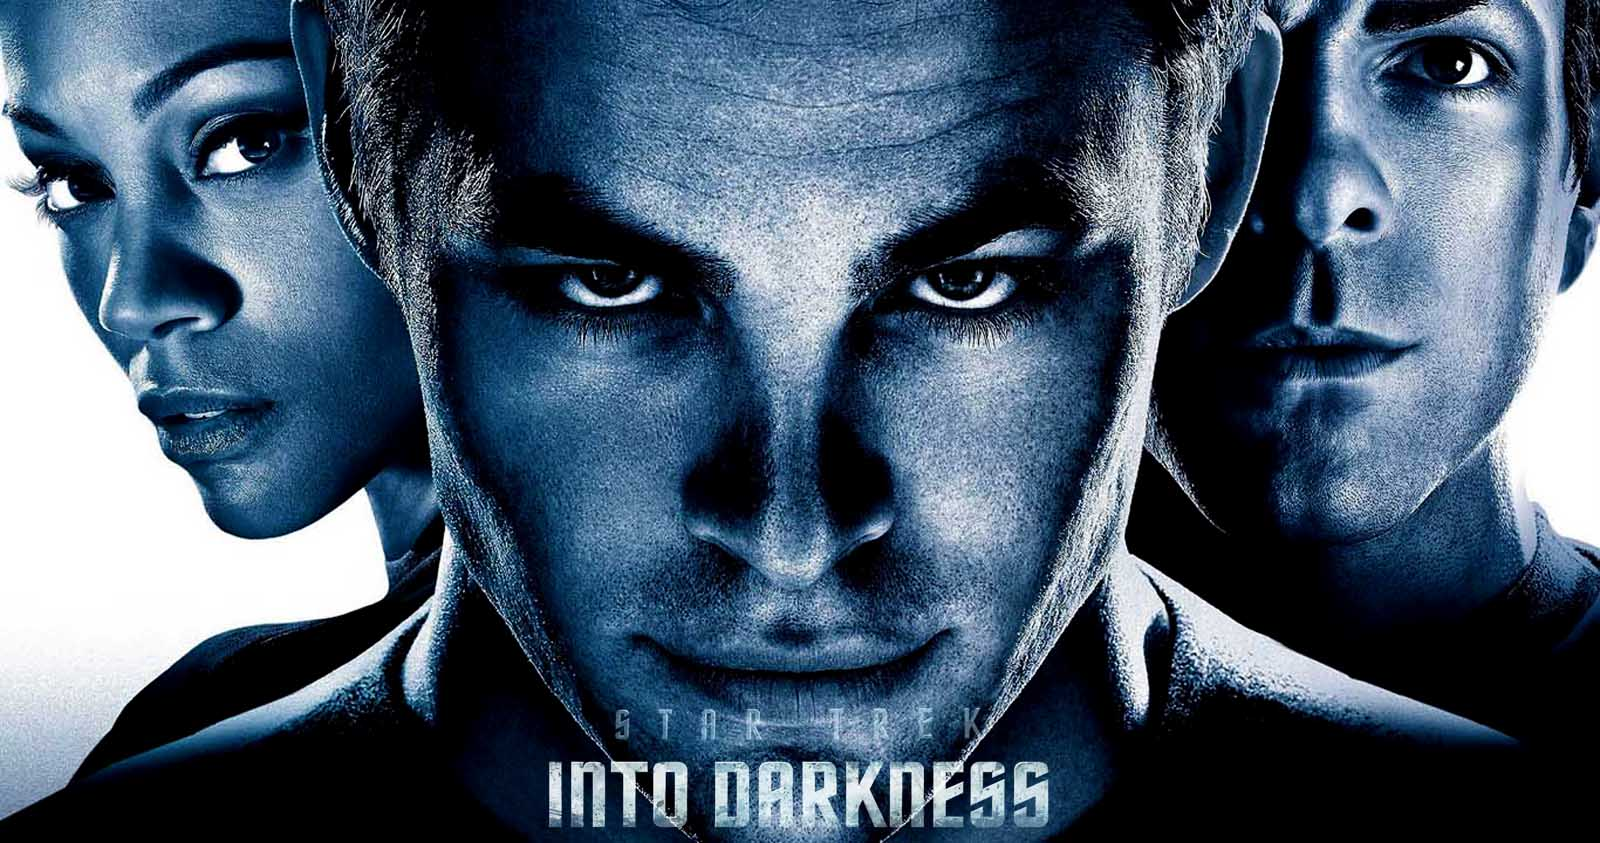 Star Trek Into Darkness 2013 Movie HD WallpapersImage to Wallpaper 1600x843